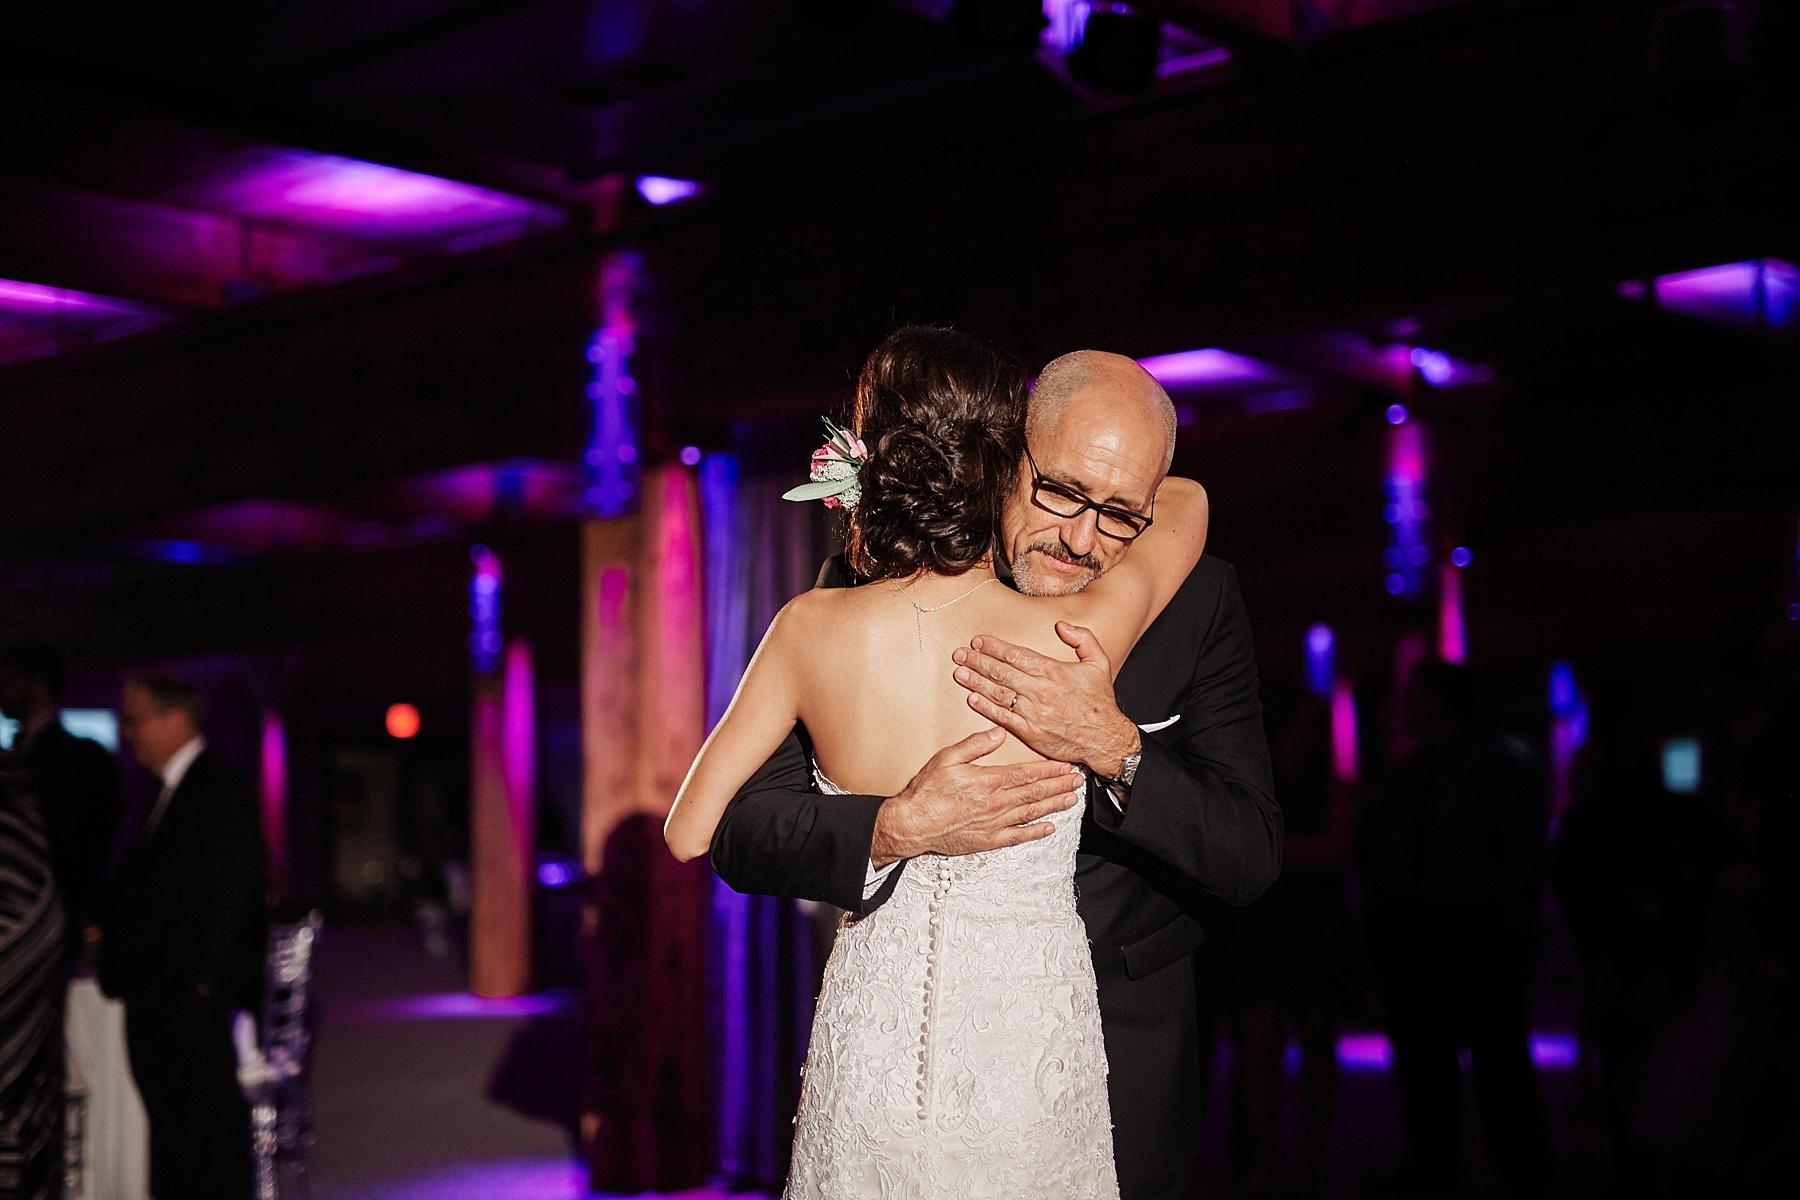 ABULAE-Wedding-Saint-paul-MN-Josh-Sofia-Wedding-Mears-Park_0850.jpg